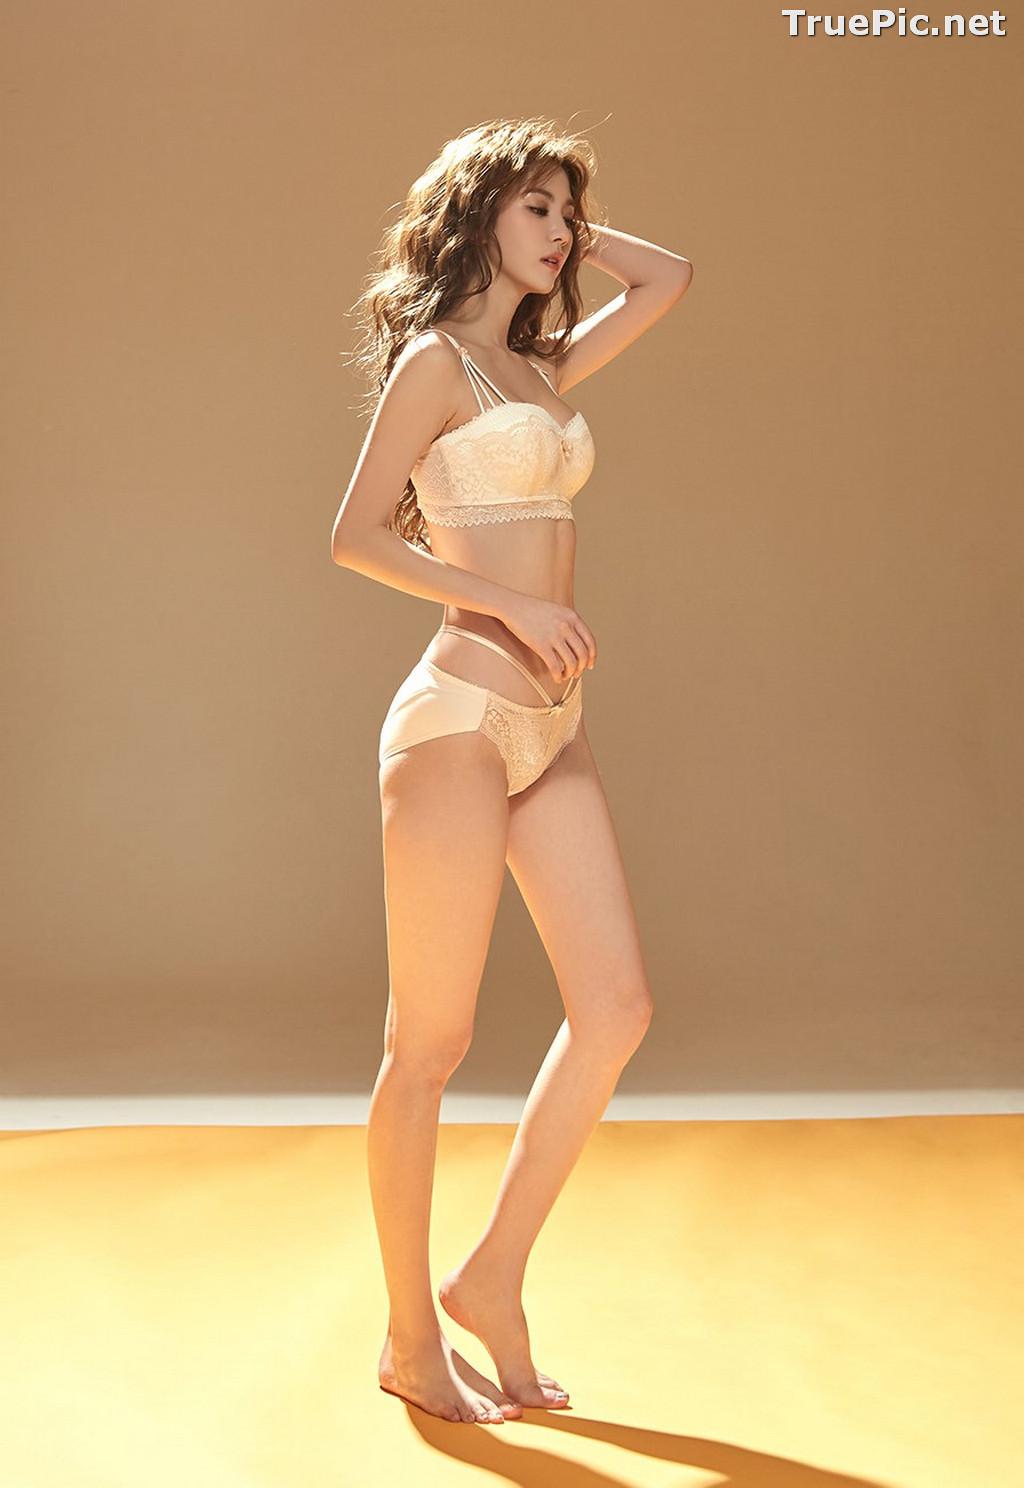 Image Korean Fashion Model – Lee Chae Eun (이채은) – Come On Vincent Lingerie #7 - TruePic.net - Picture-10